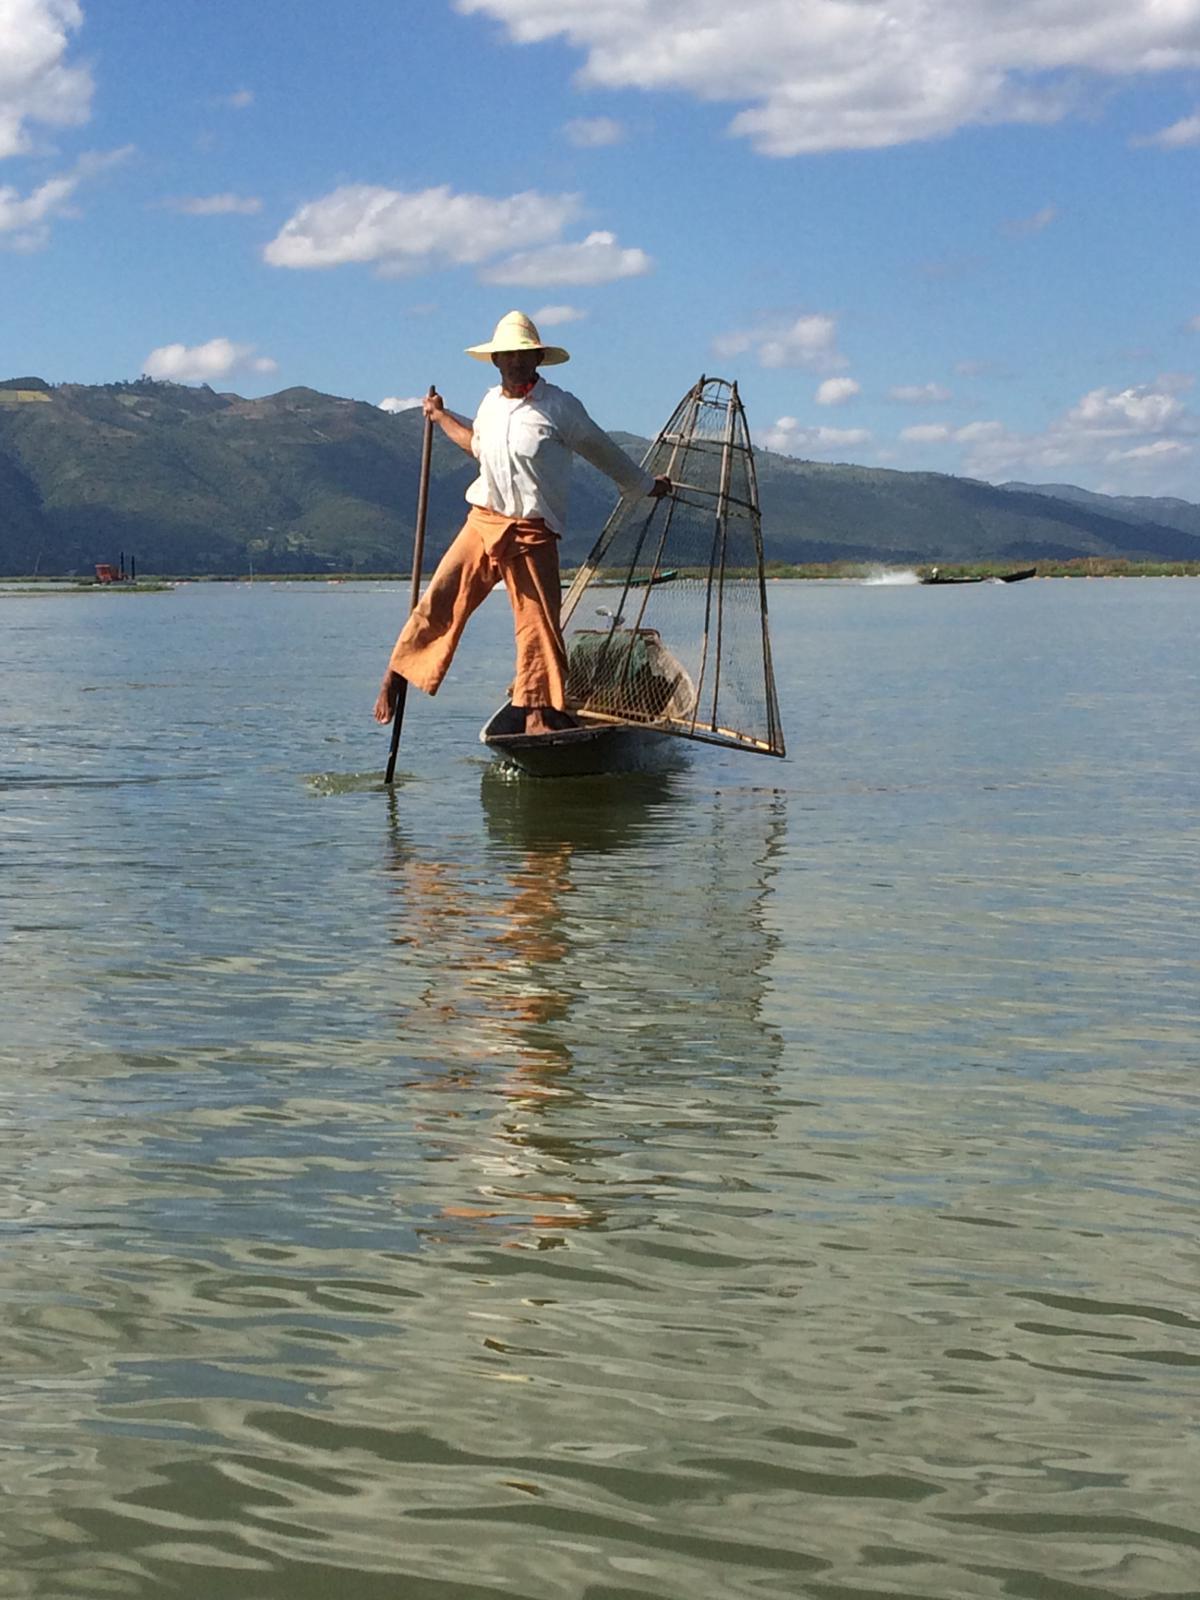 myanmar-birmania-lago-inle-rete-conica-pescatore.jpg